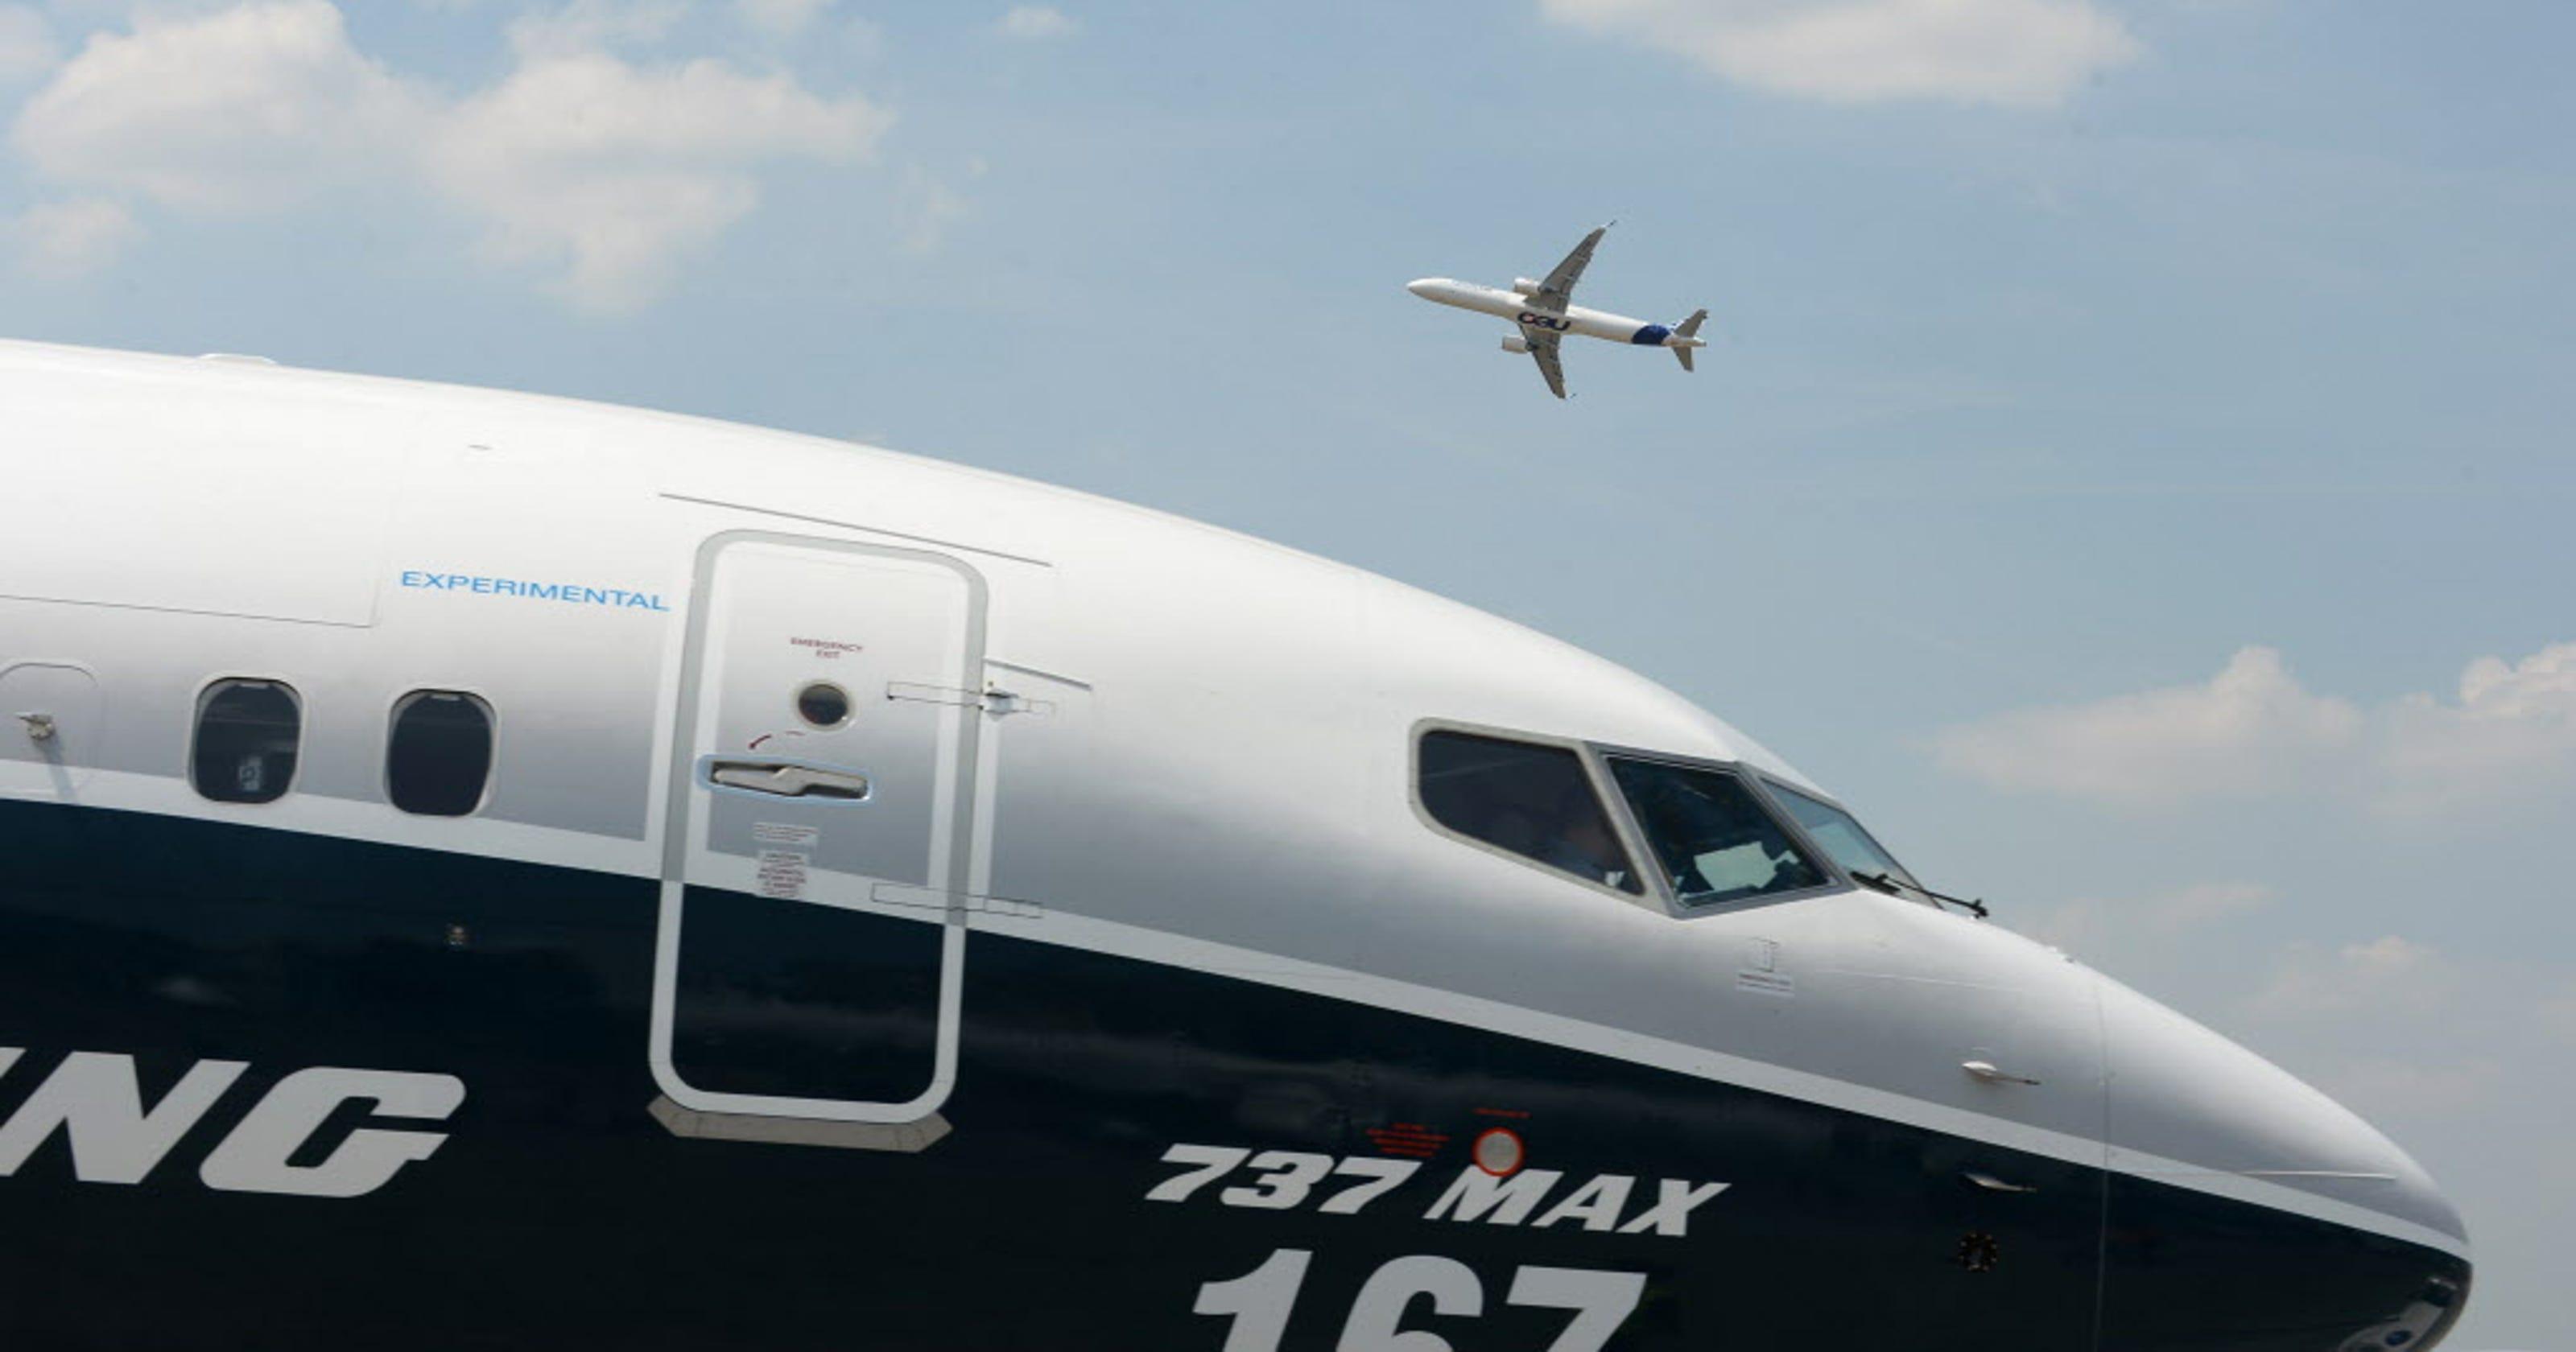 Resultado de imagen para assembly line Boeing 737 max